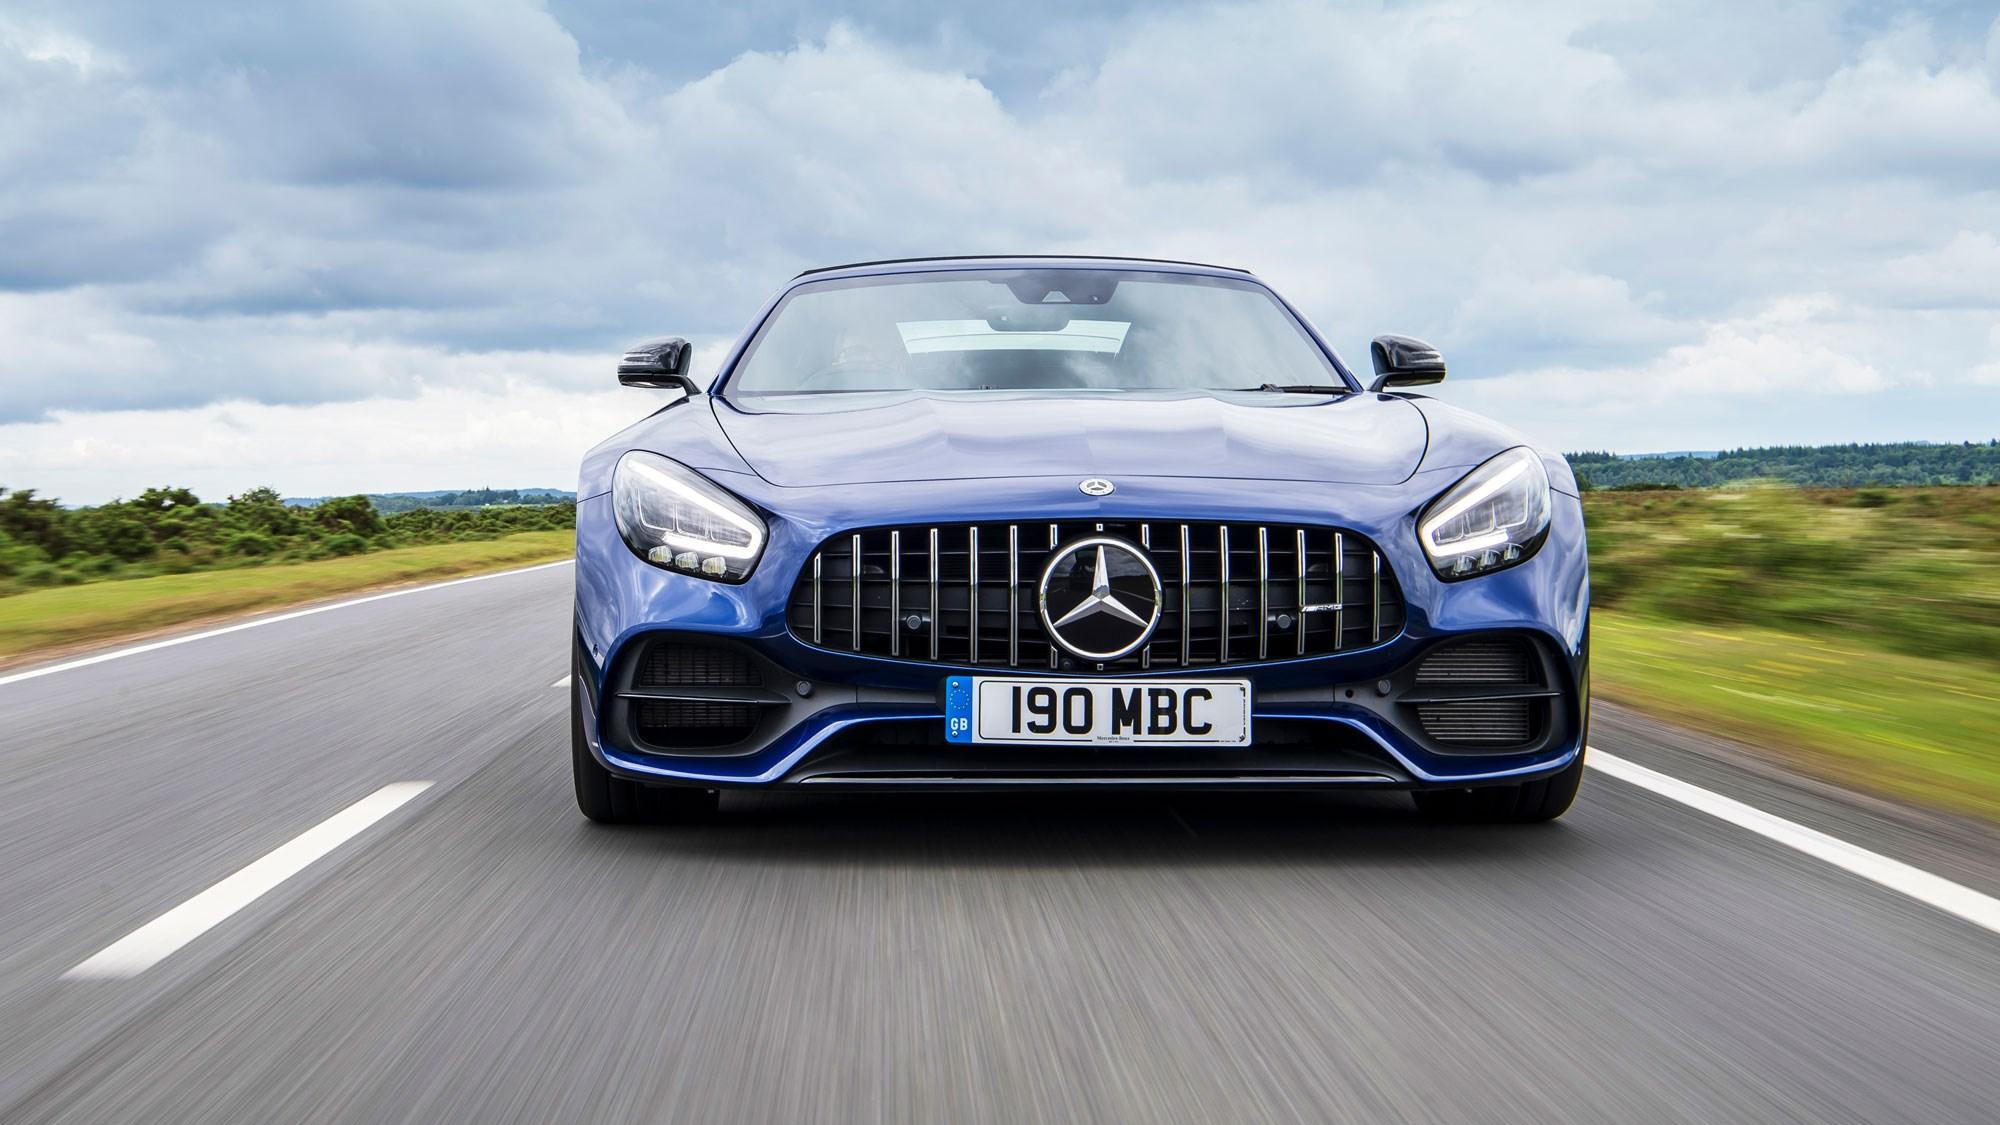 Mercedes Amg Gt S Roadster Review V8 Thrills Car Magazine